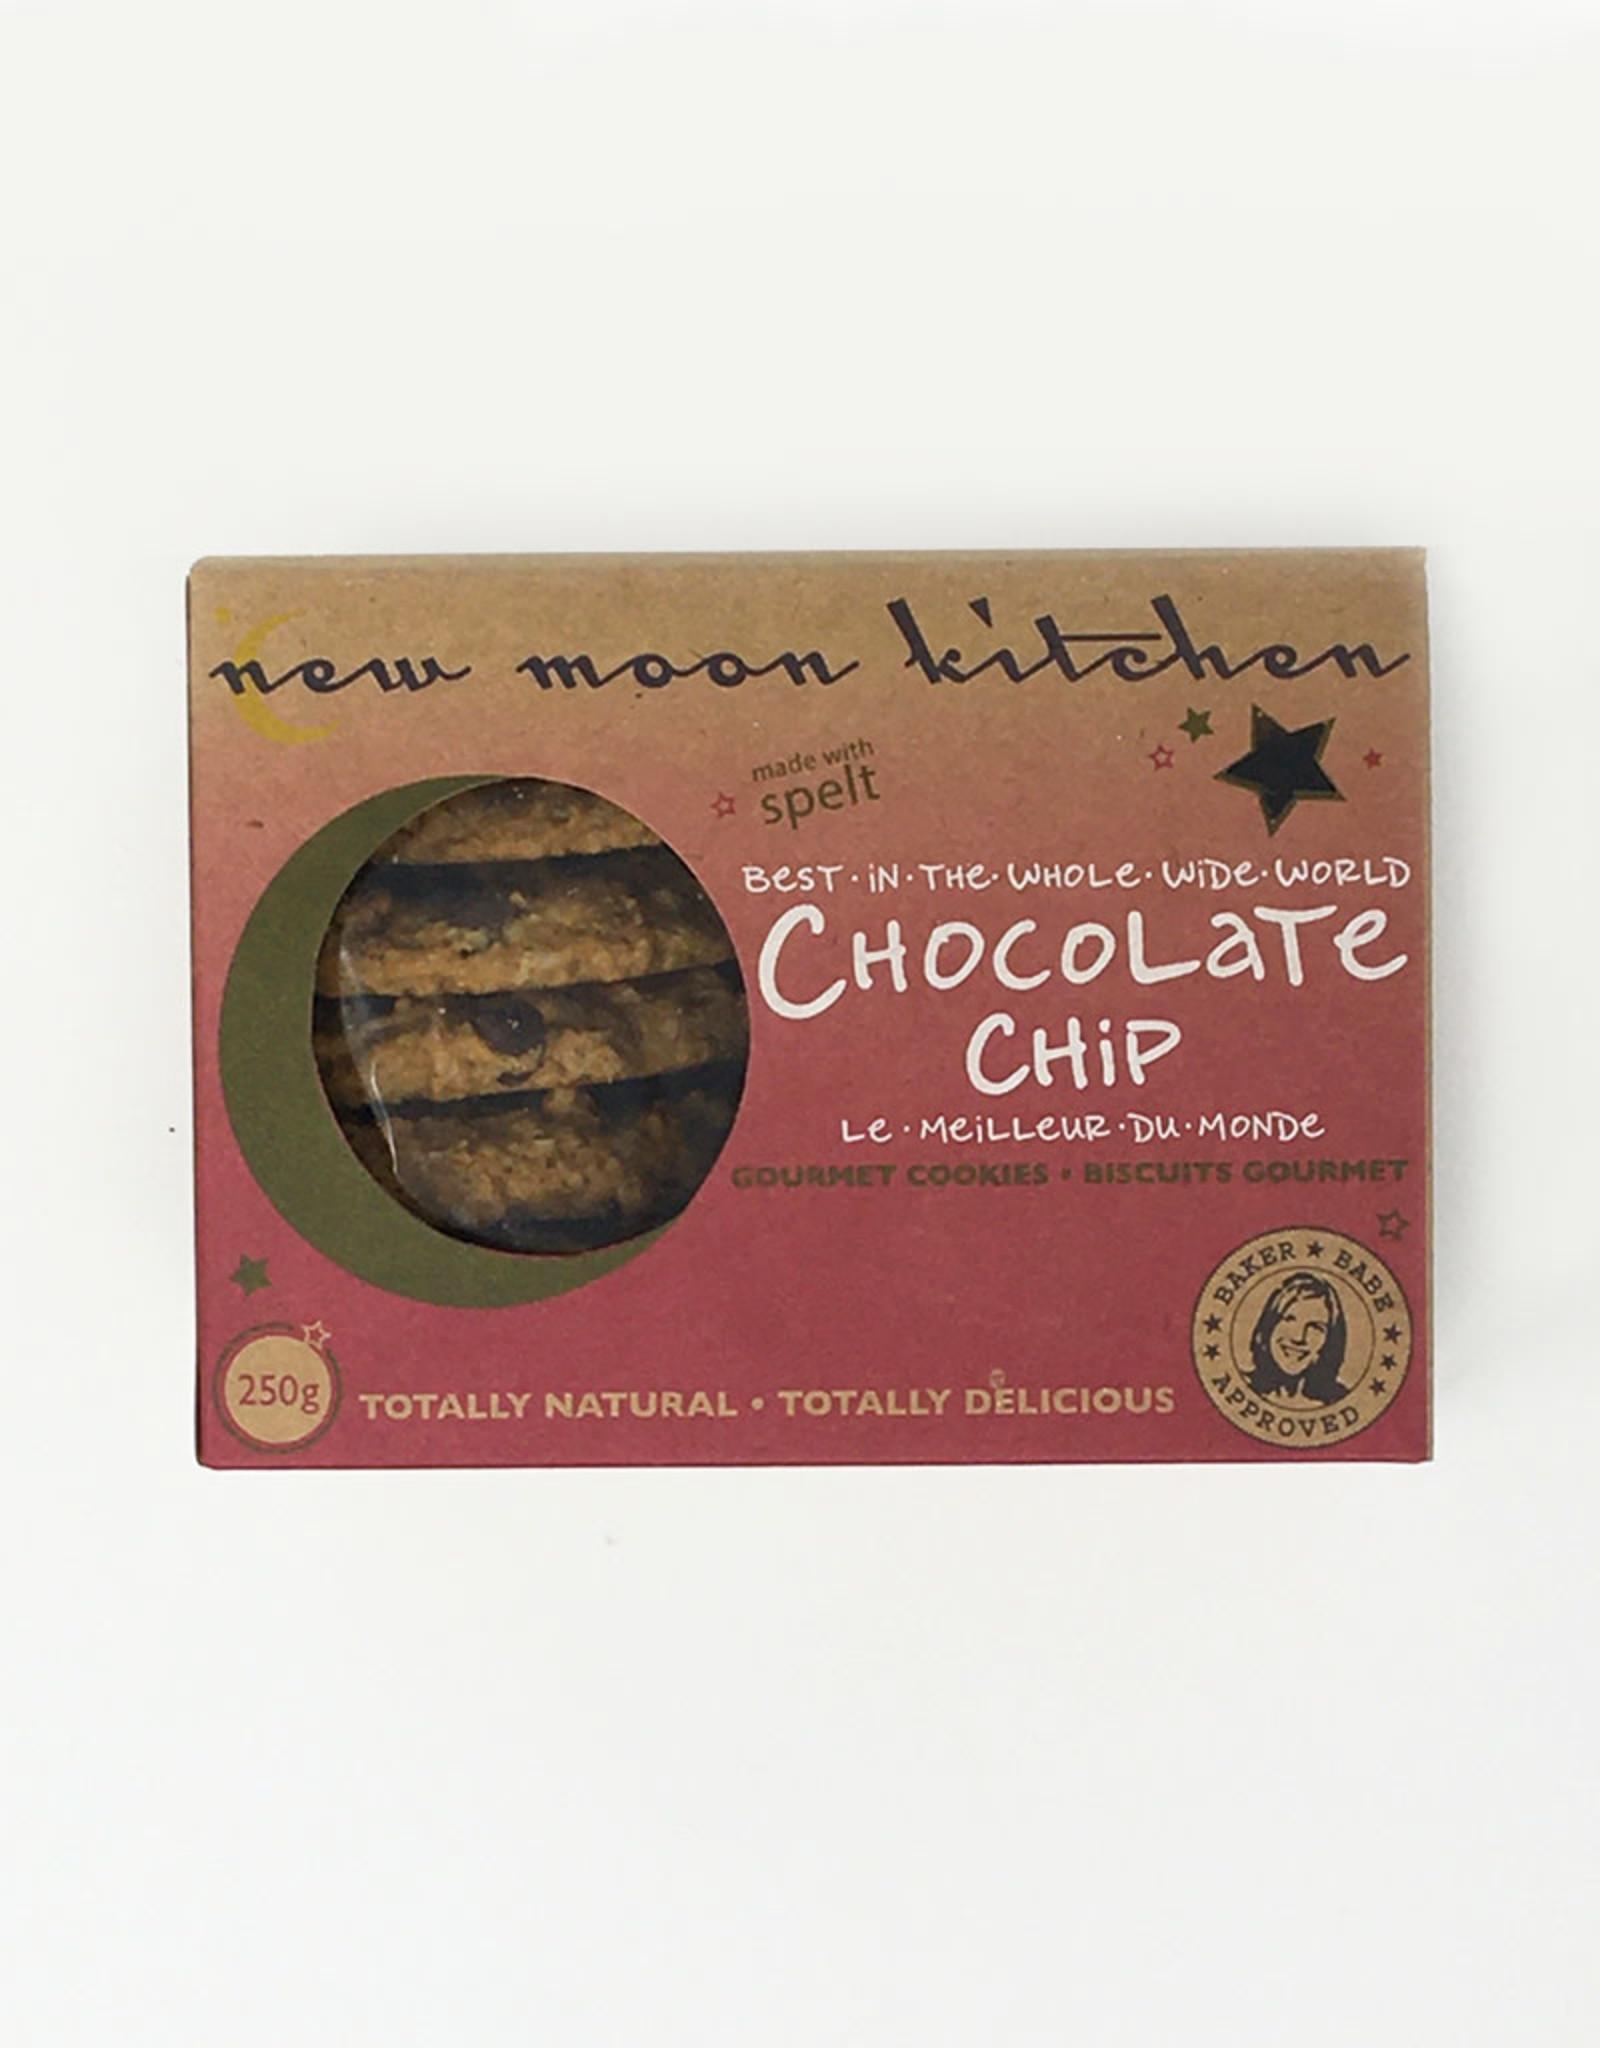 New Moon Kitchen New Moon Kitchen - Cookies, Chocolate Chip (box)